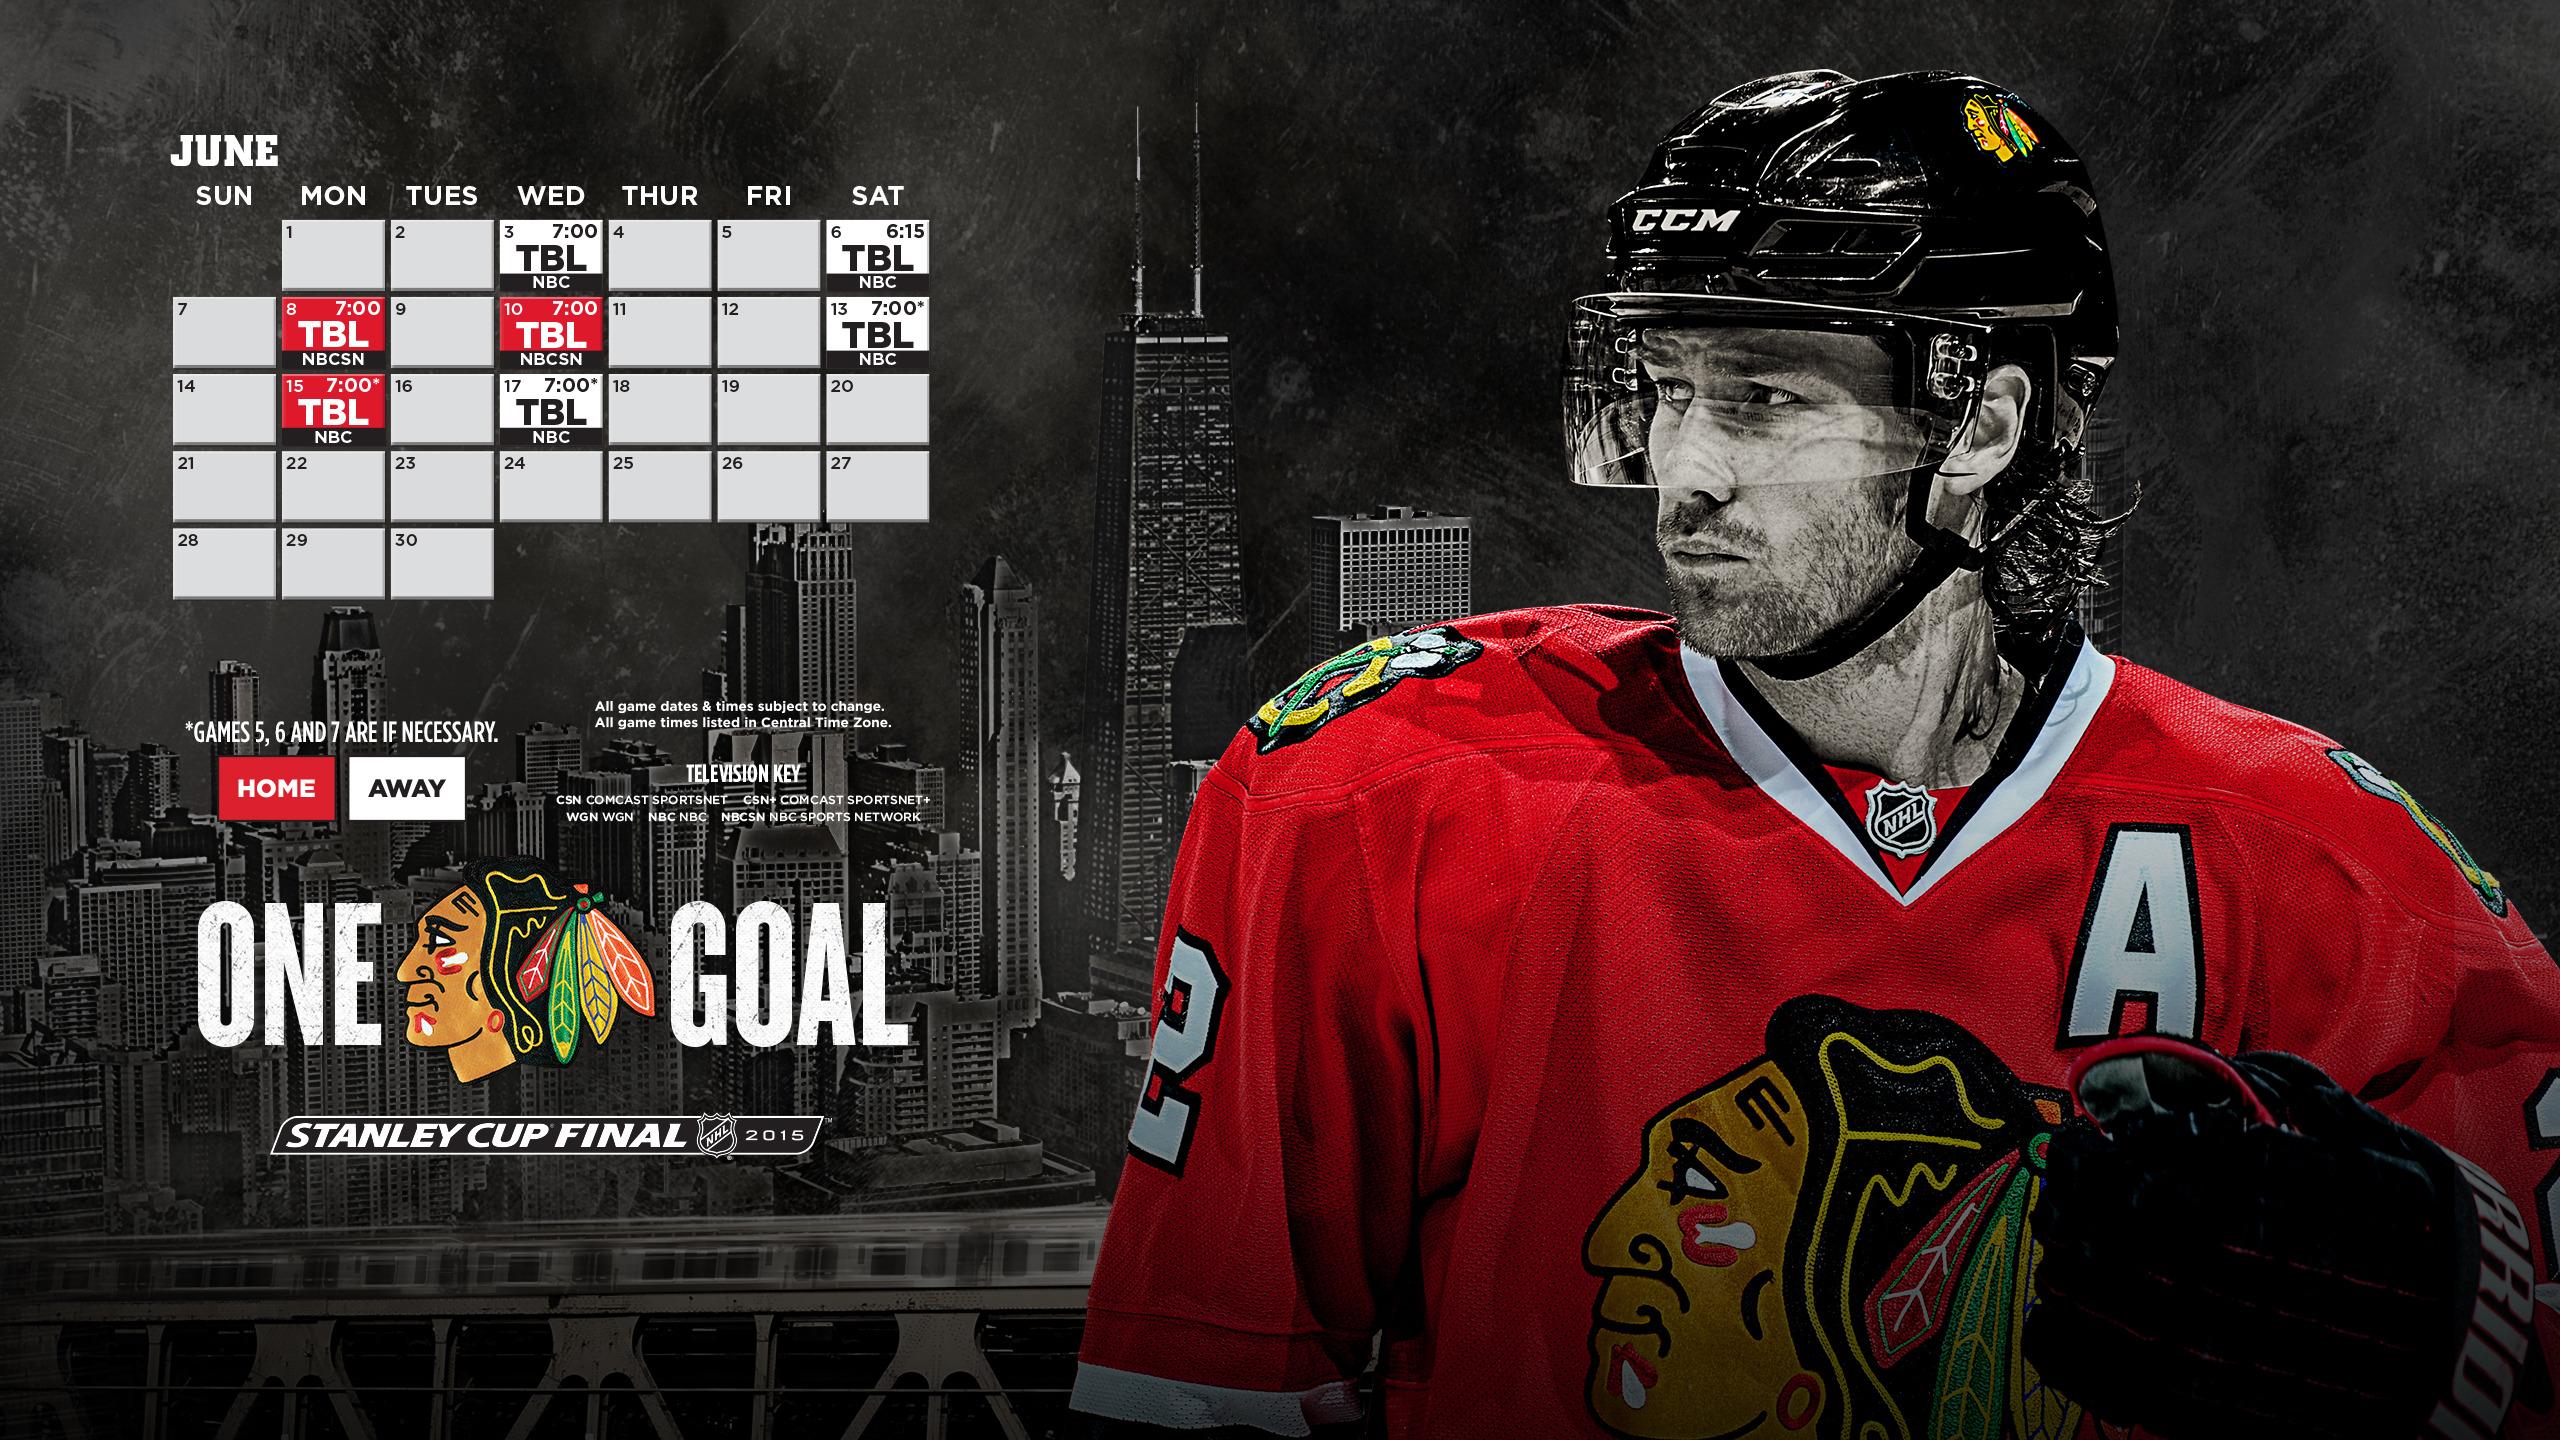 Stanley Cup Final Schedule 2560x1440